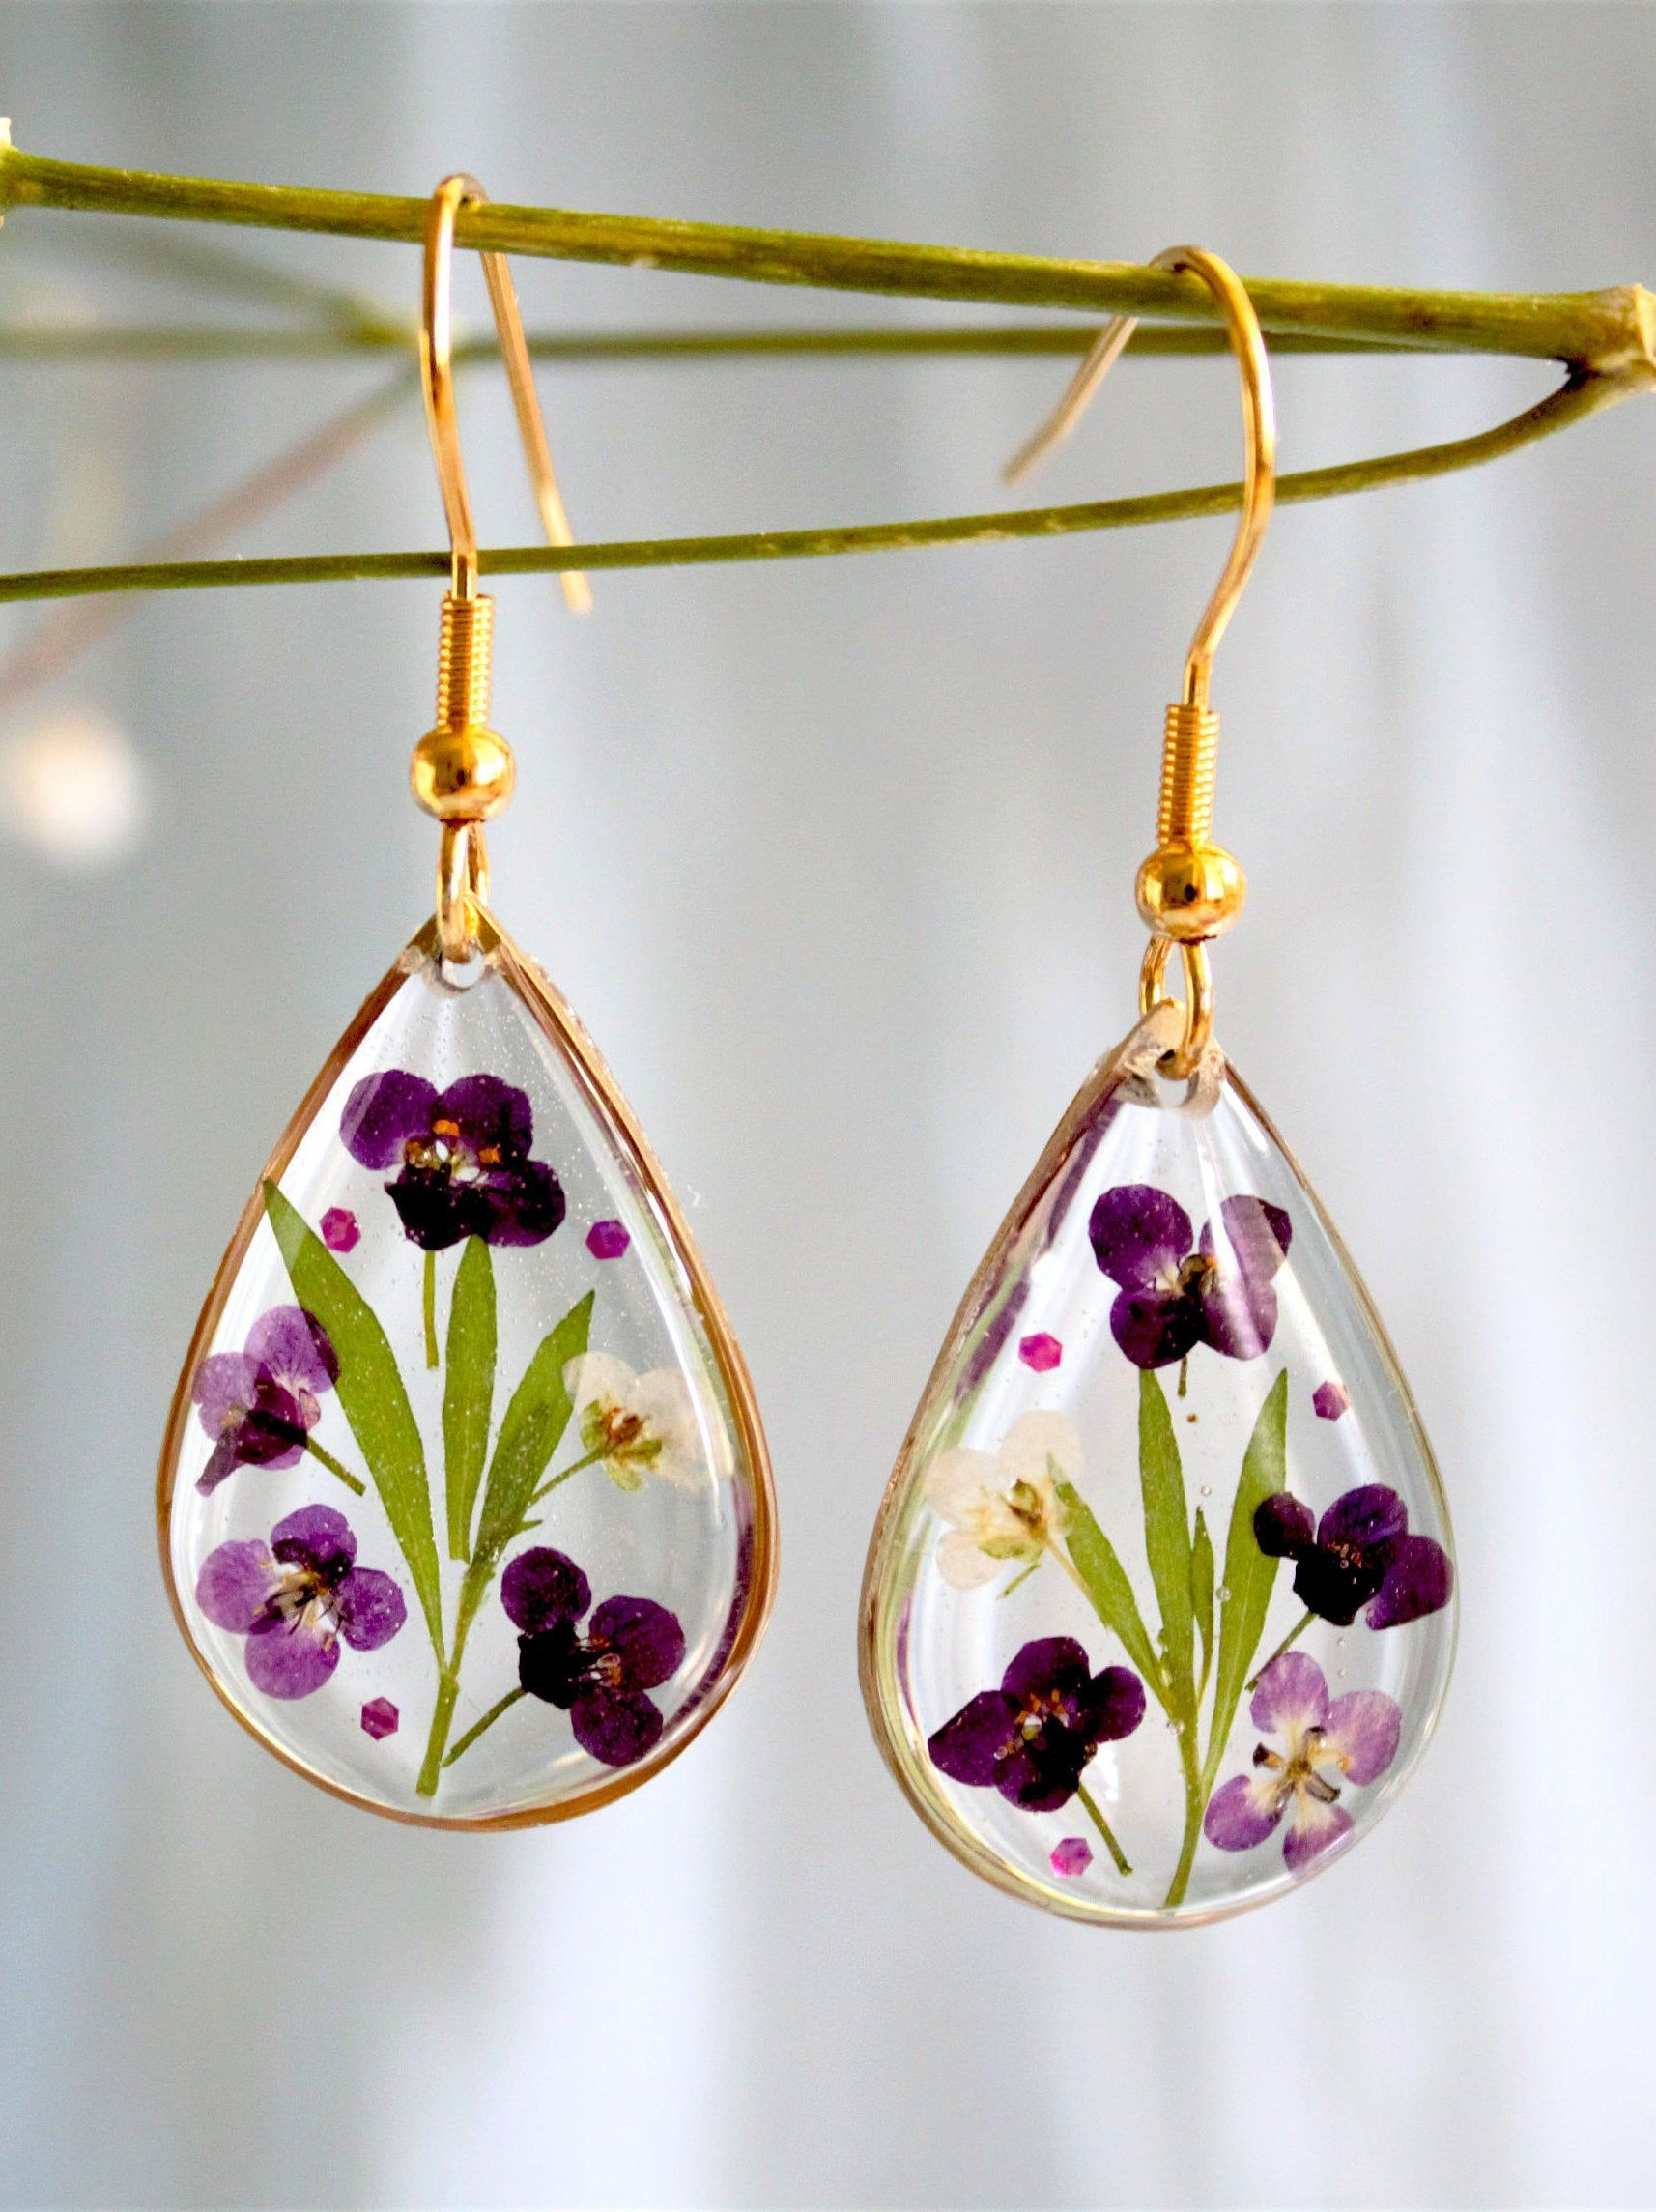 Dry flower petals handmade resin earrings